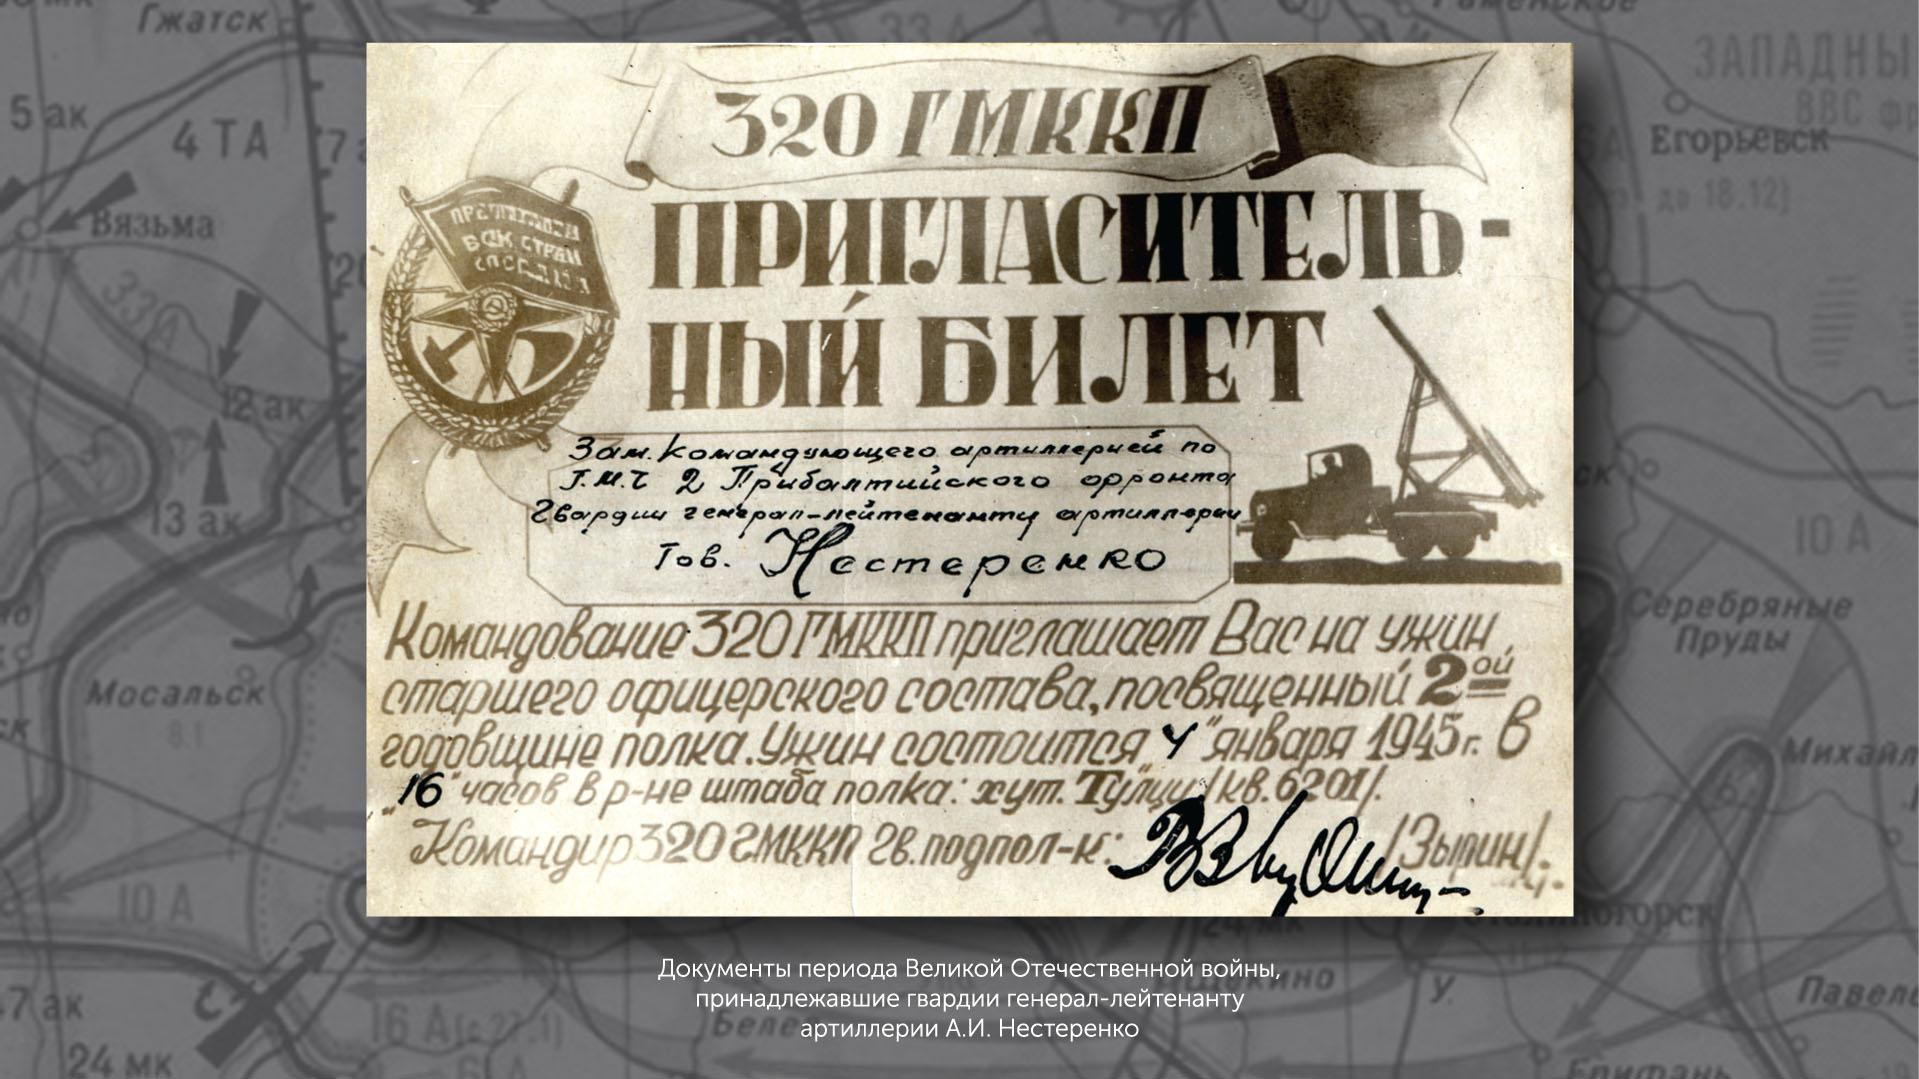 Документы А.И. Нестеренко